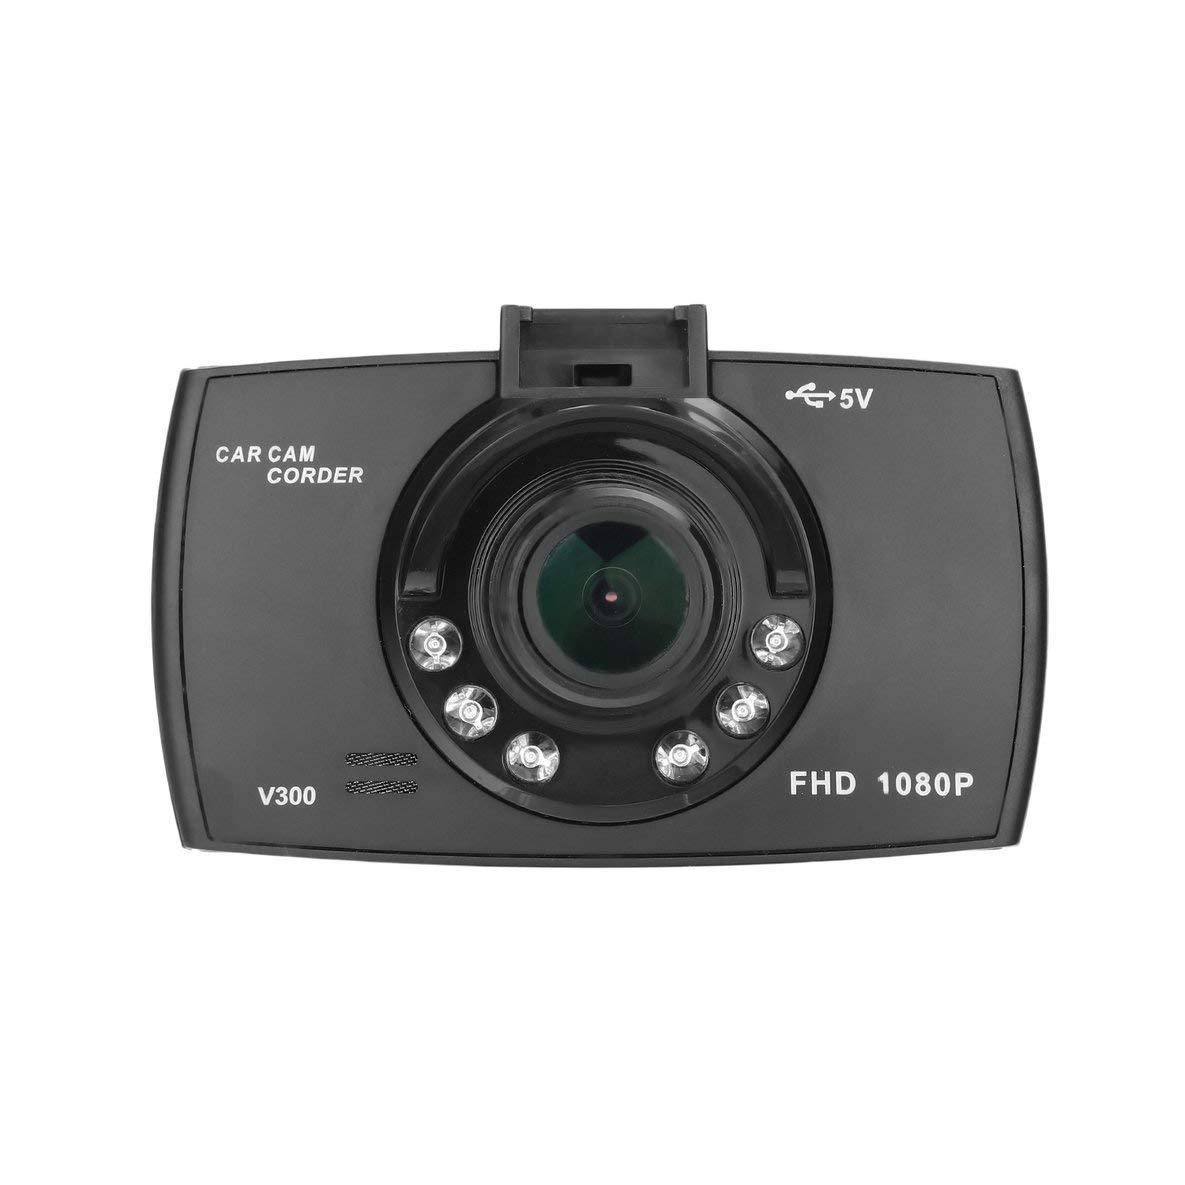 V300 Full HD 1280 * 1080 P 2, 4 Zoll TFT LCD Display Auto DVR Dash Kamera 140 ° Weitwinkel Recorder G-Sensor Bewegungserkennung Moliies